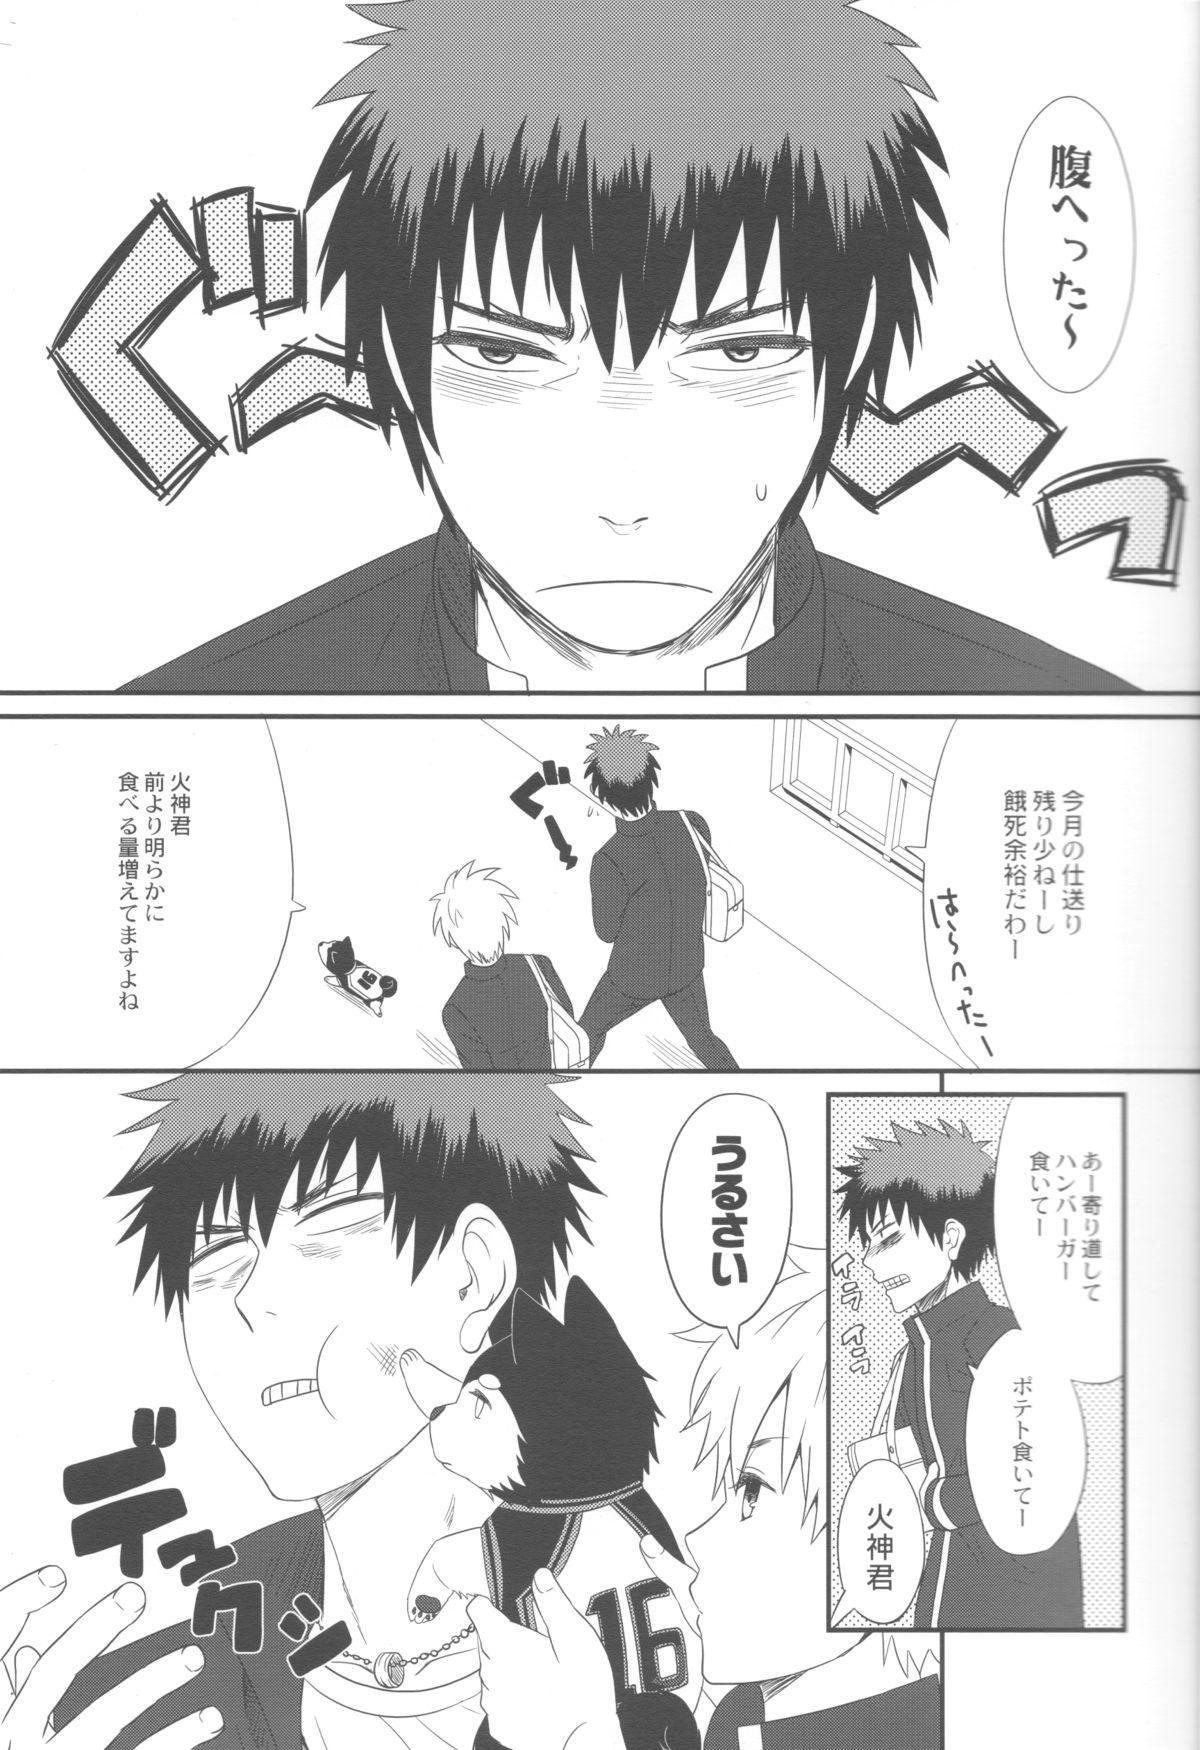 Kuroko to Kagami to Tokidoki Nigou to 3